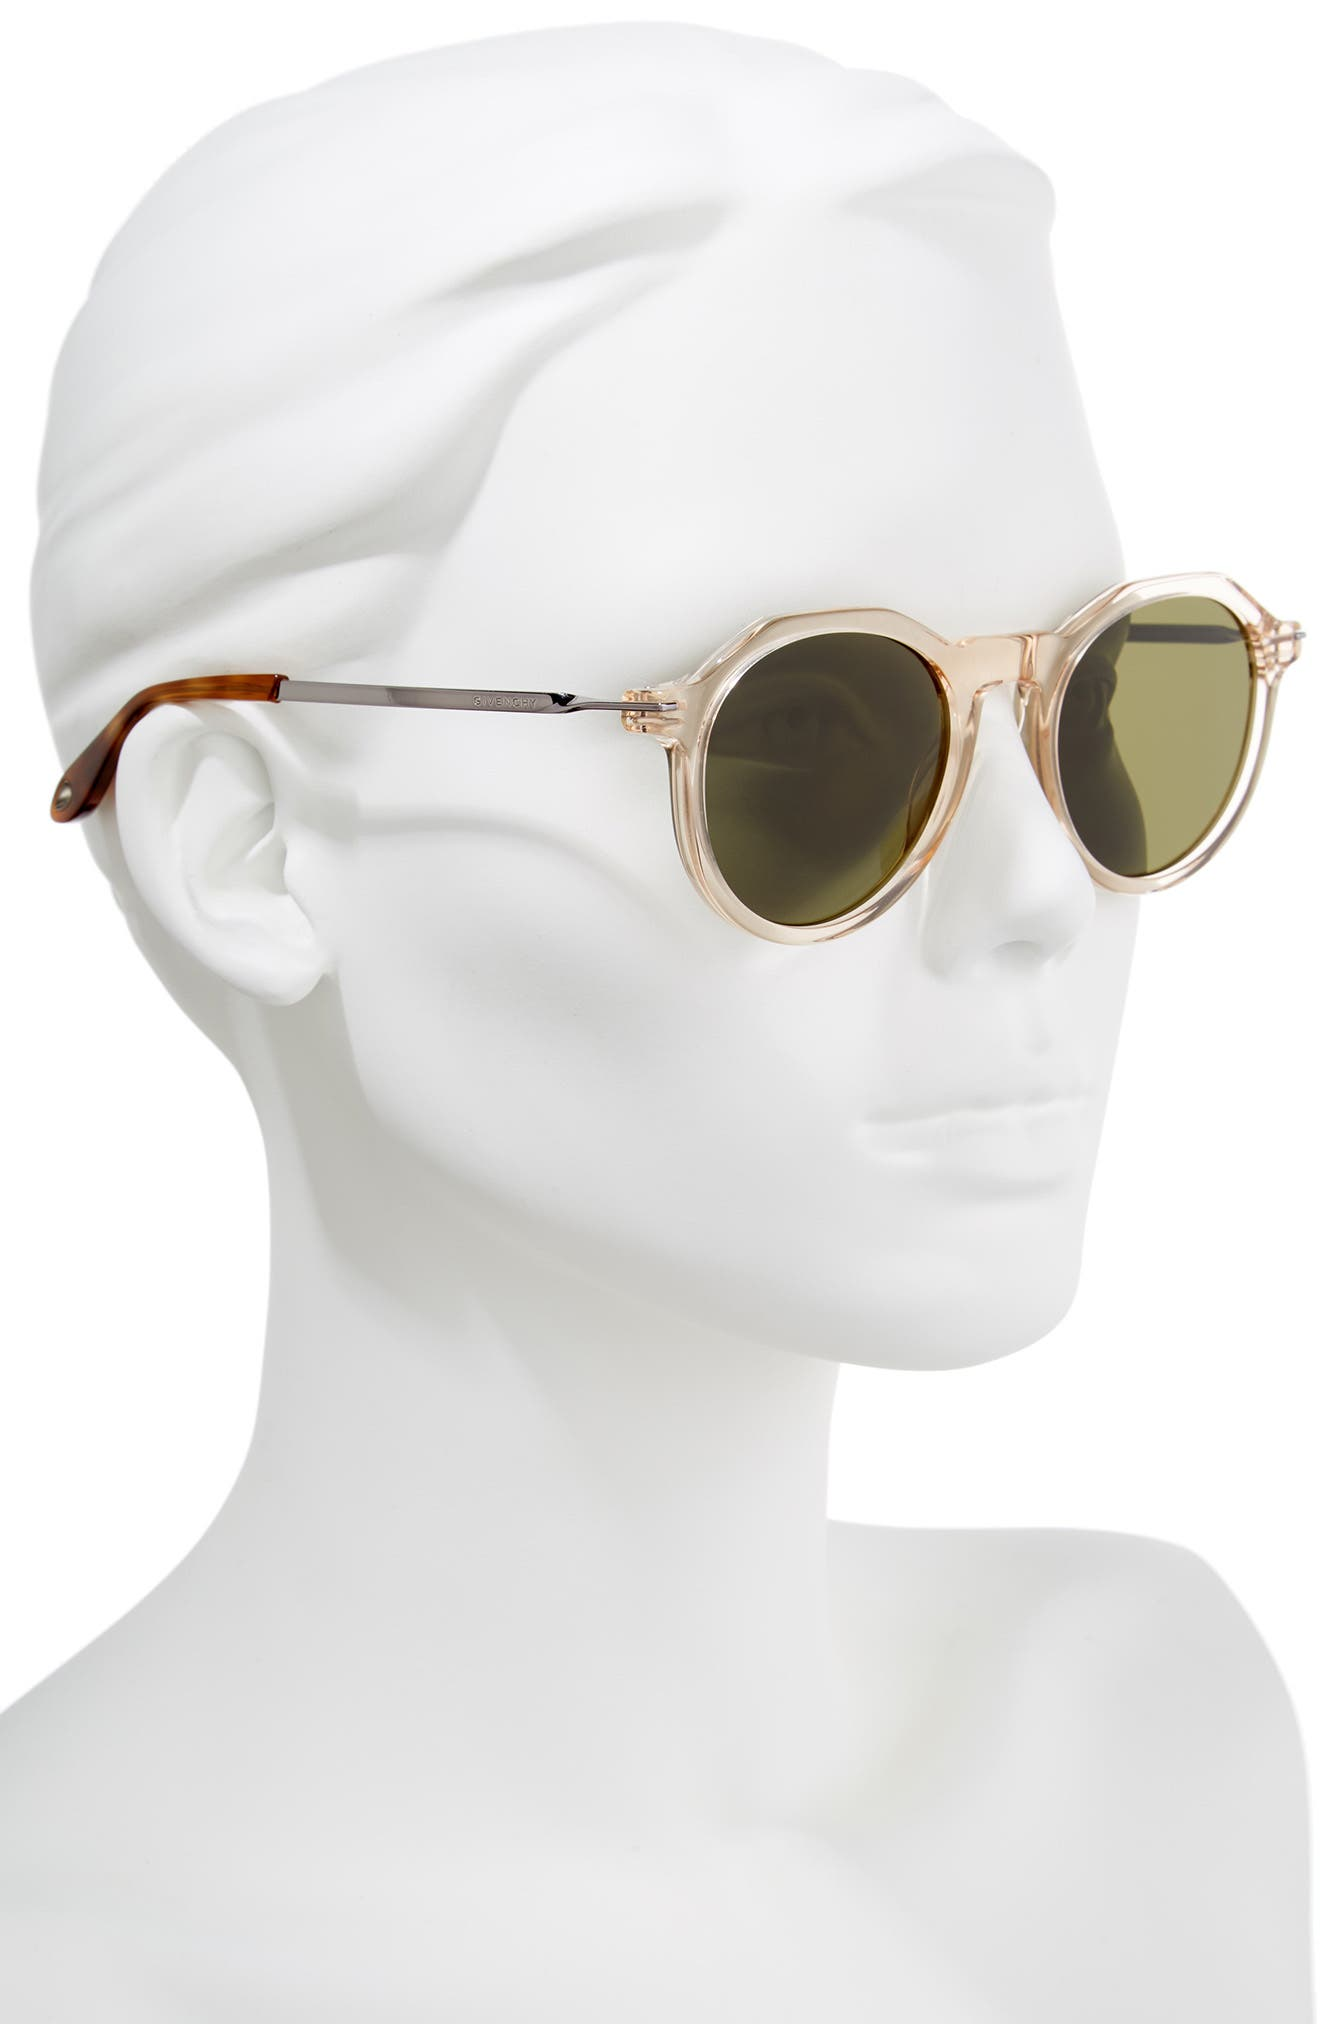 51mm Round Sunglasses,                             Alternate thumbnail 6, color,